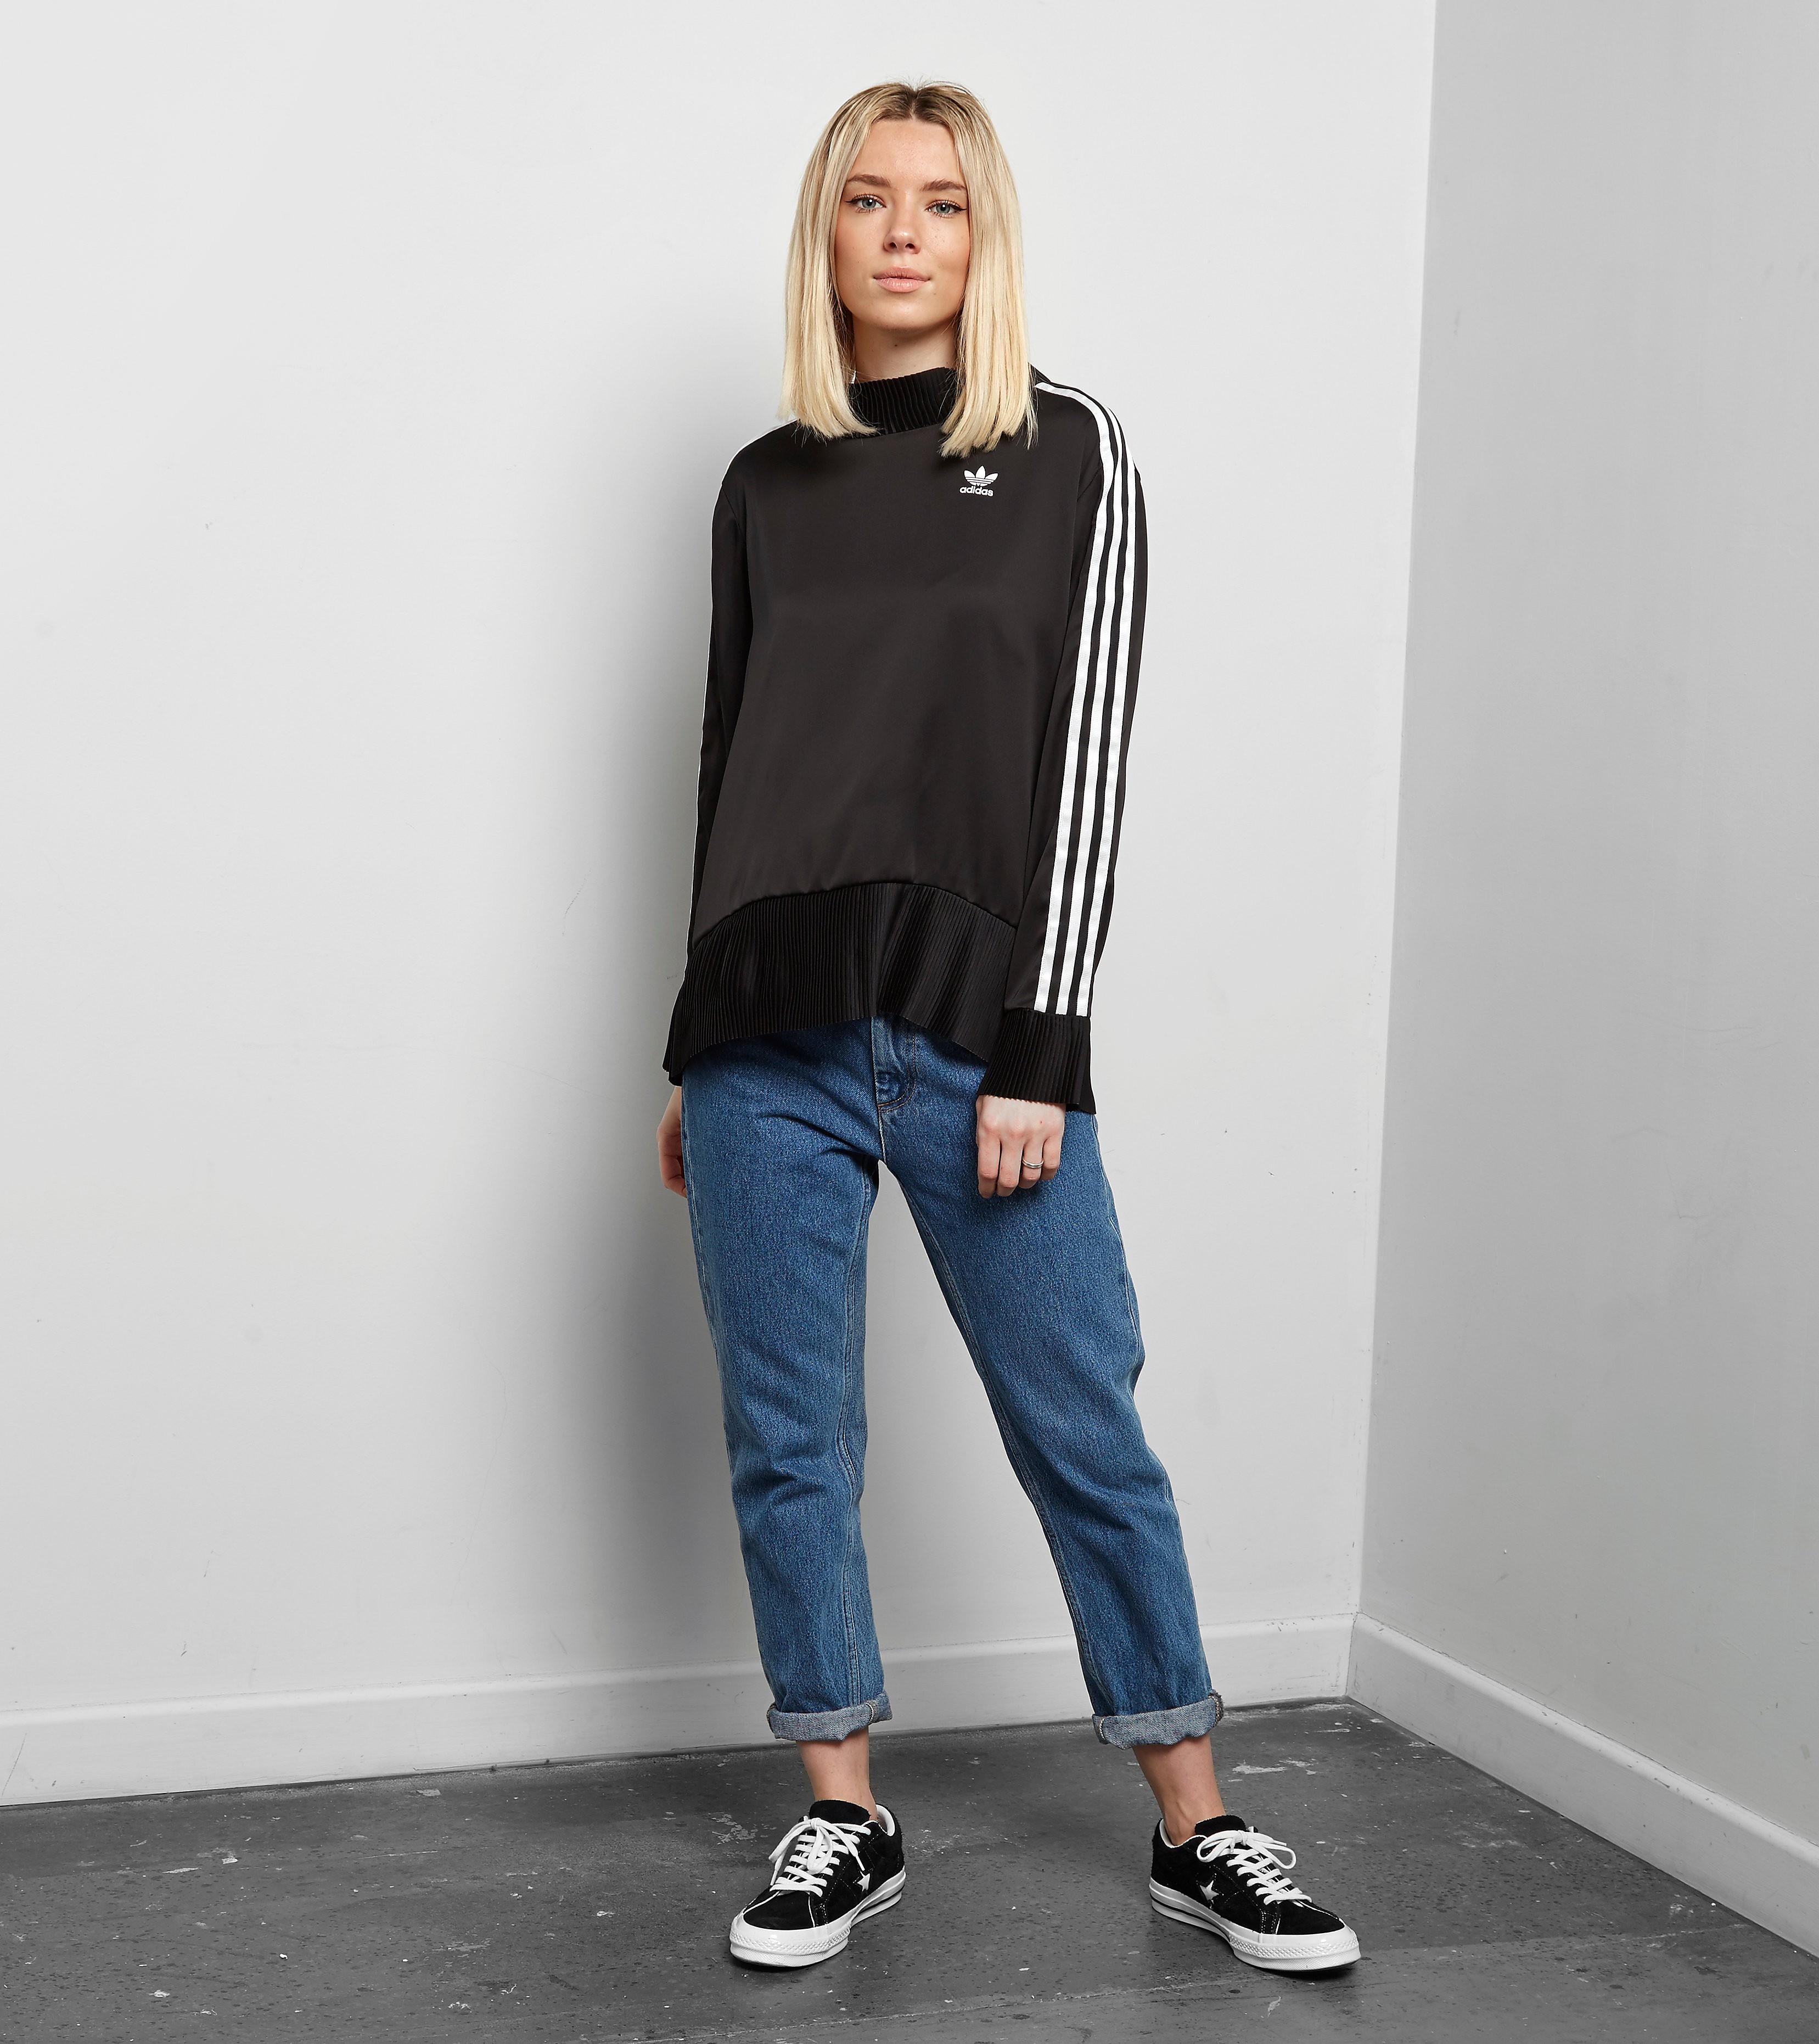 adidas Originals 3-Stripes Sweater